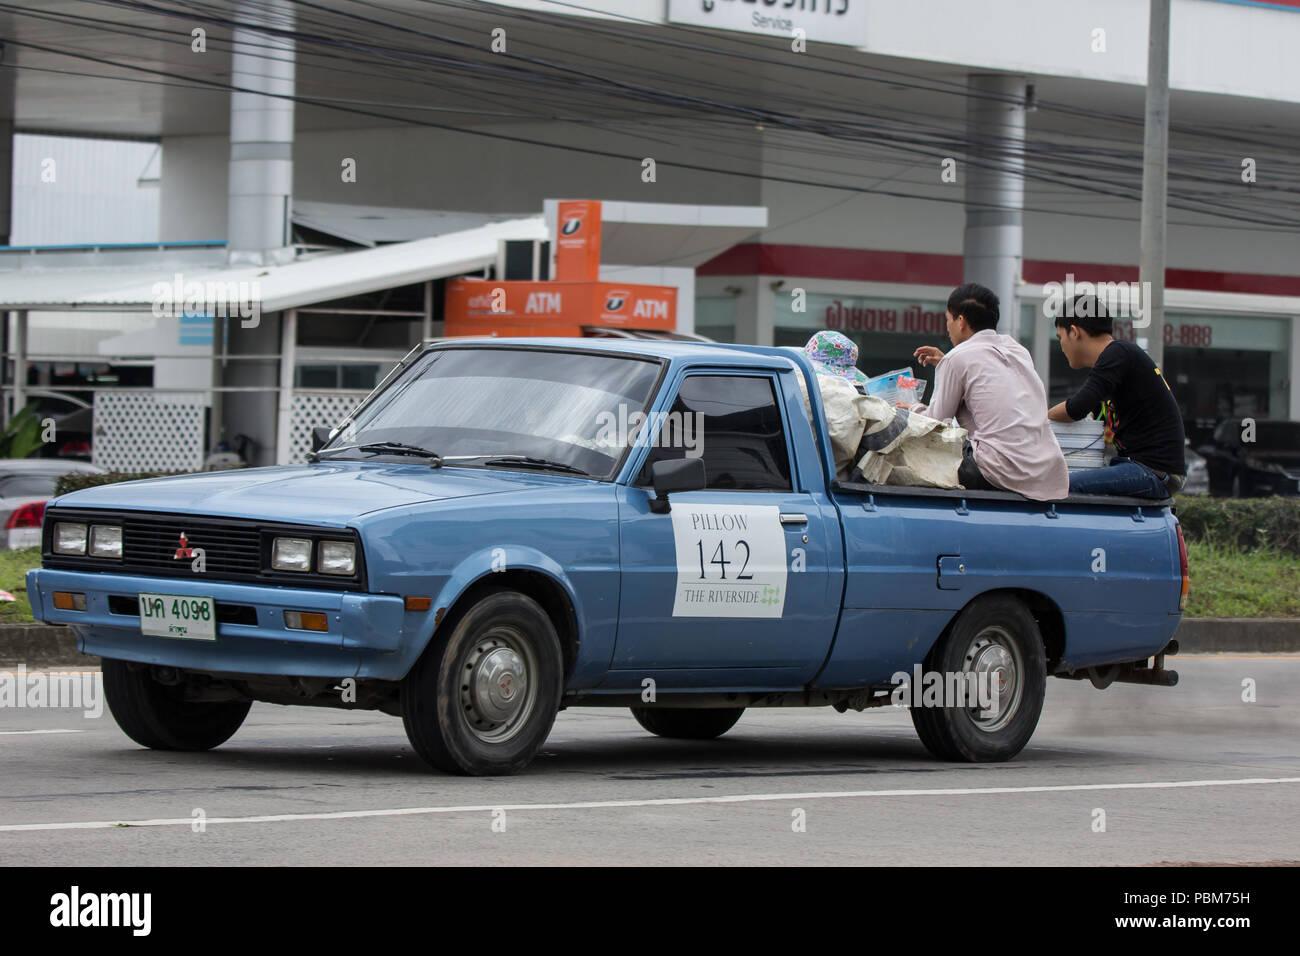 Mitsubishi Pick Up Truck On Stock Photos & Mitsubishi Pick